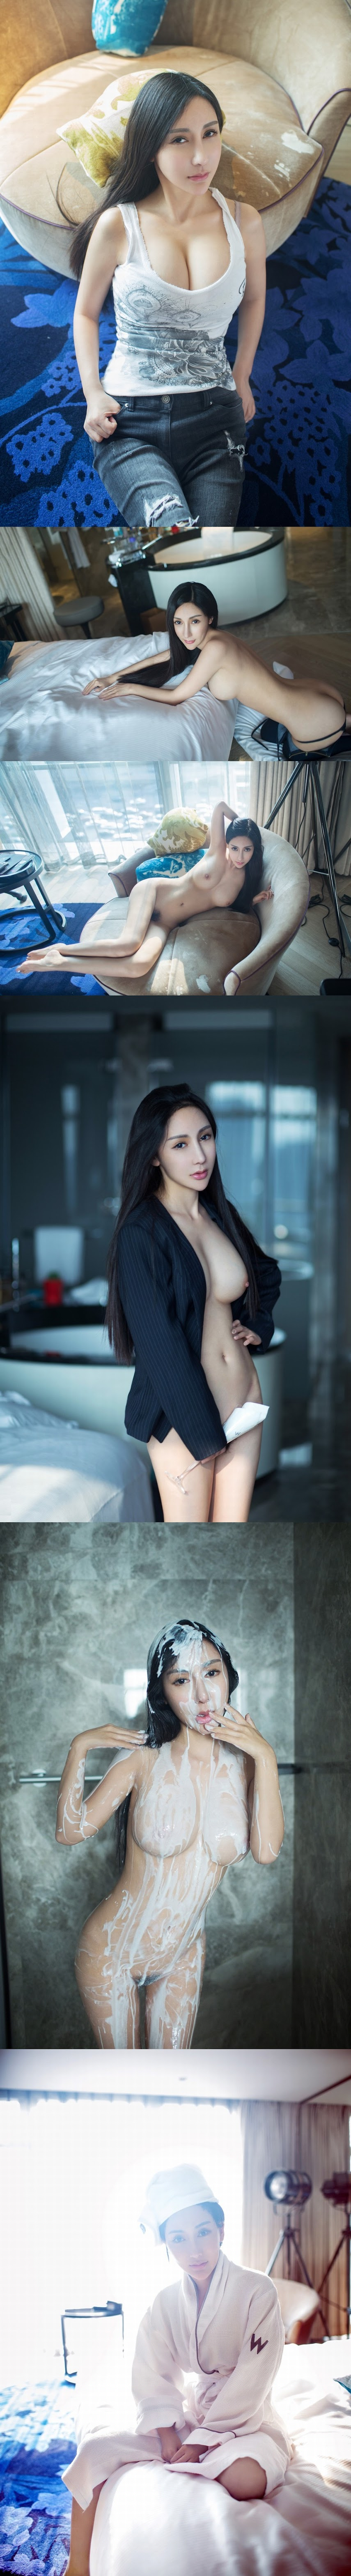 TuiGirl 55 梁棋棋 sexy girls image jav